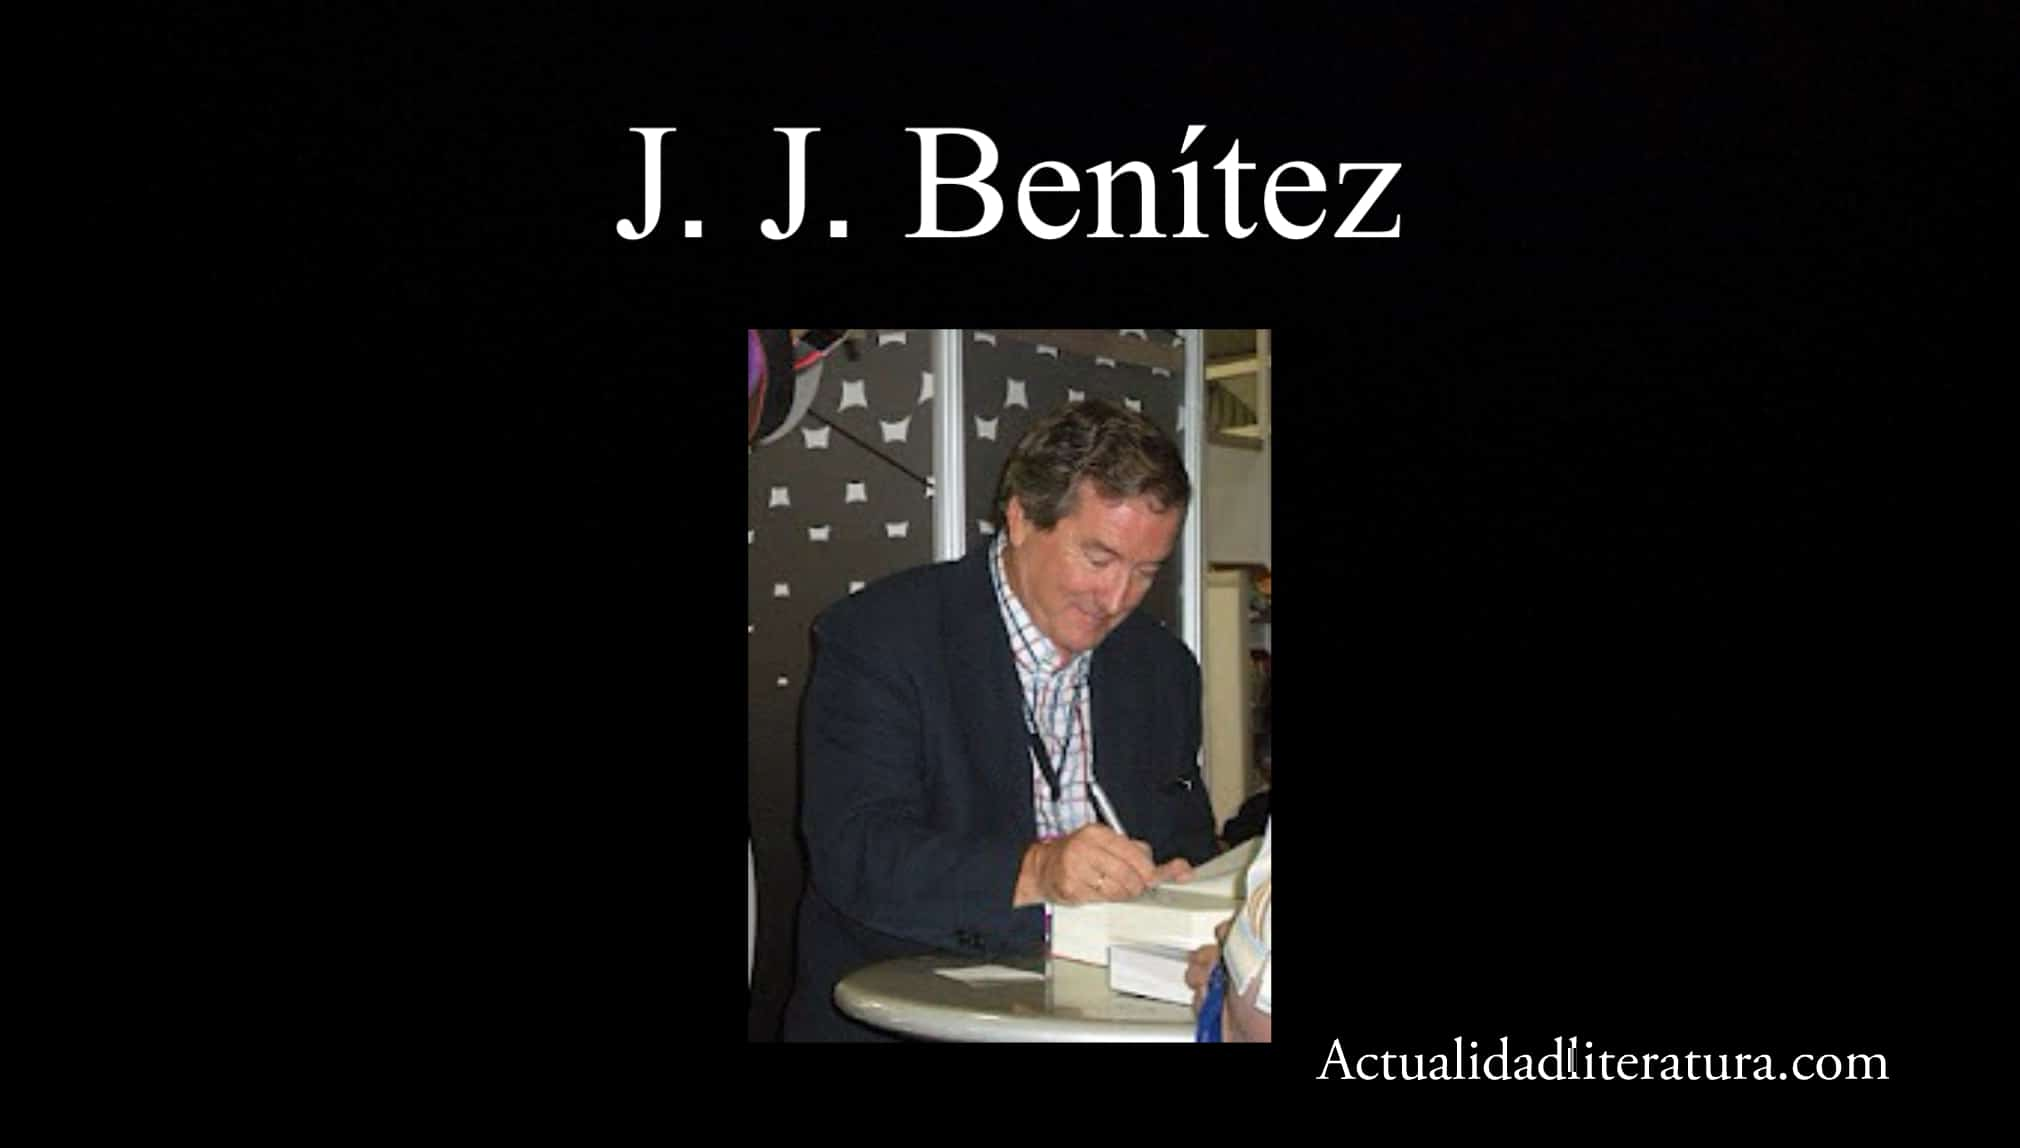 J. J. Benítez